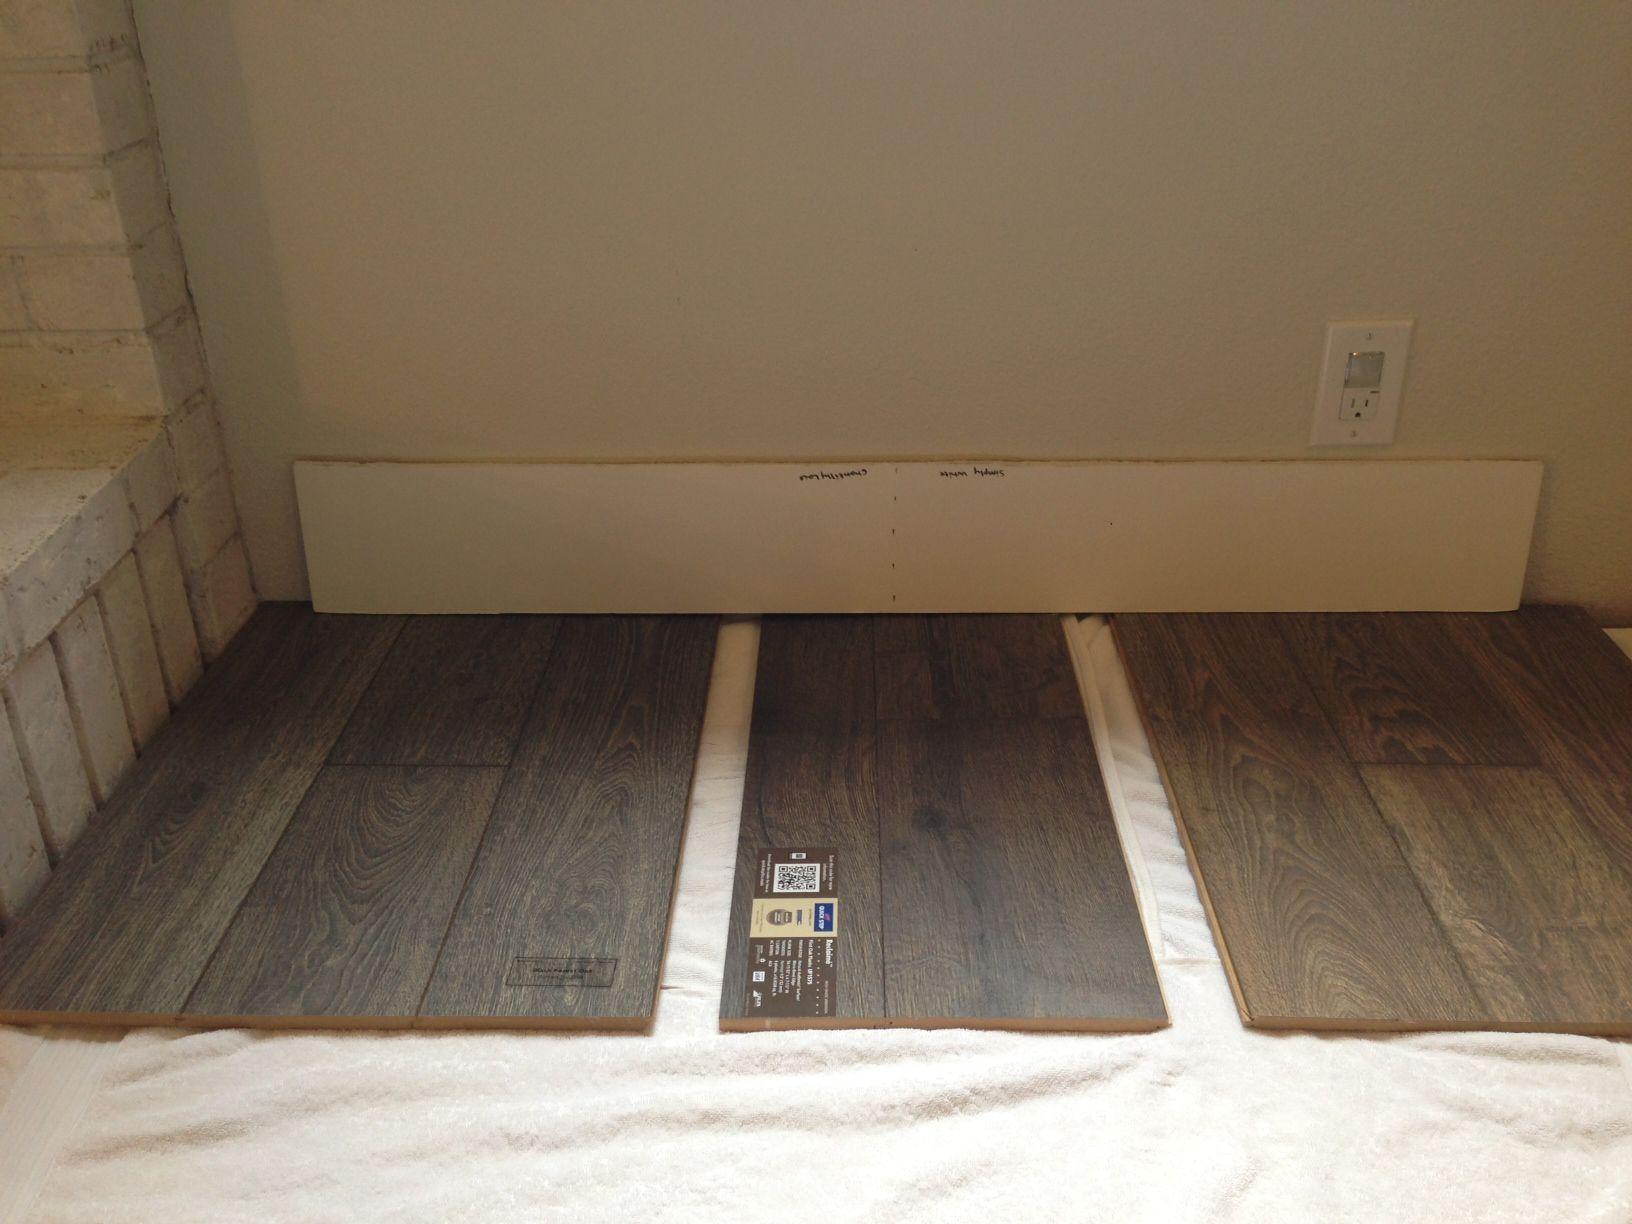 Laminate Floor Comparison Left Mannington Black Forest Oak Fumed Middle Quick Step Reclaime Flint Right Mannington Black Fore Flooring Interior Home